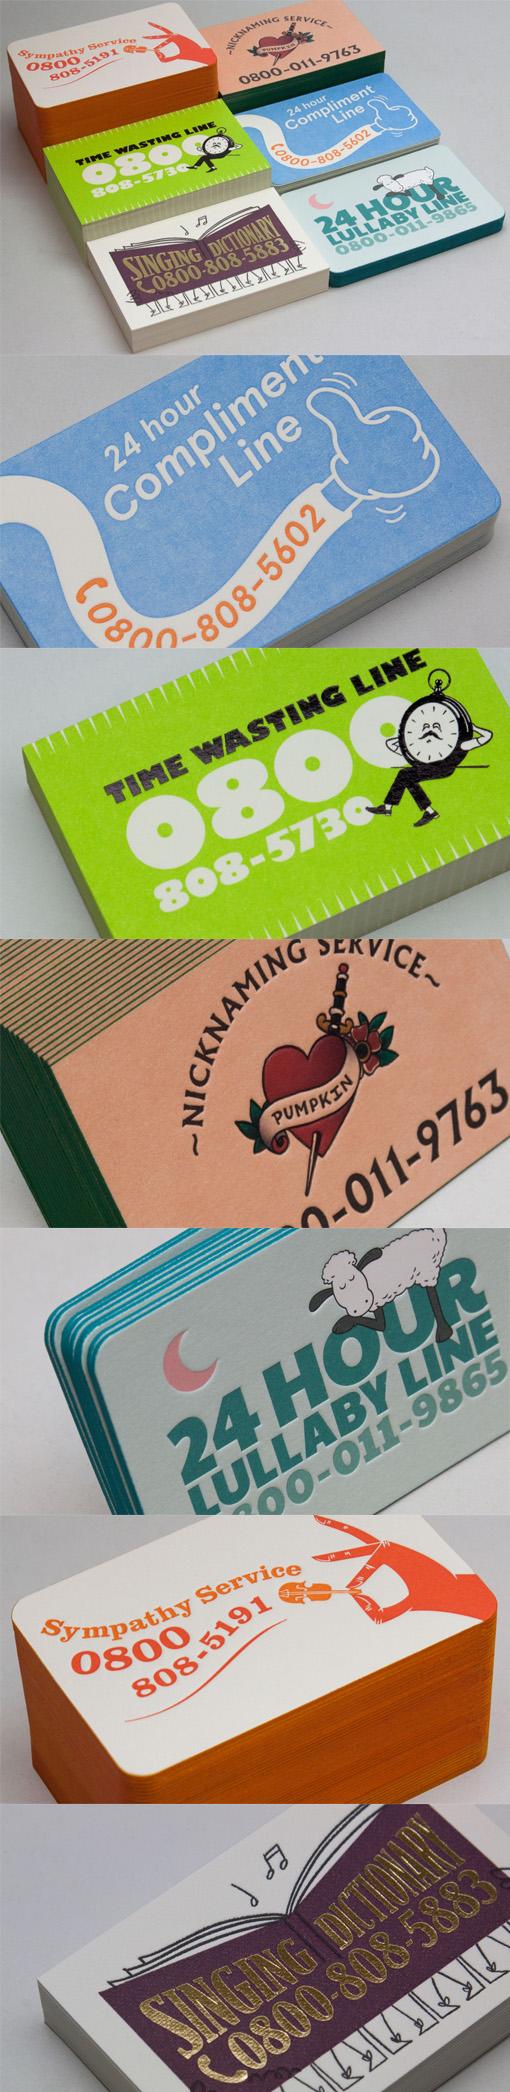 Humorous Vintage Style Fictional Phone Line Letterpress Business Card Design